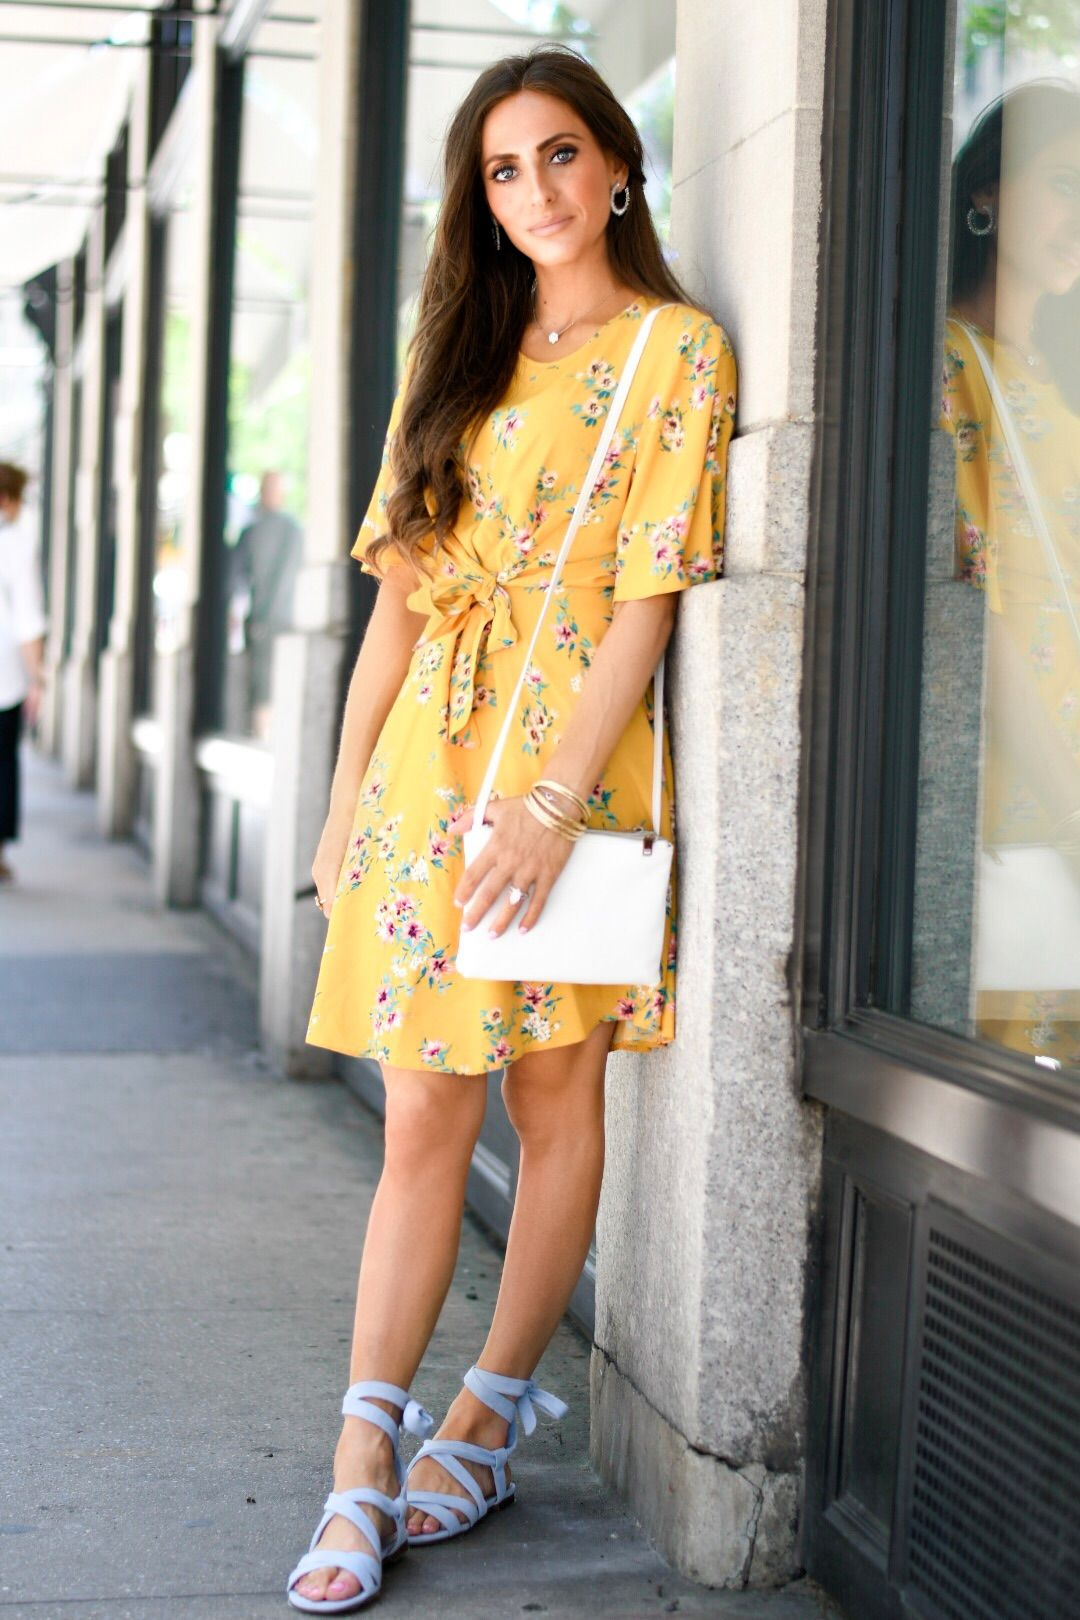 Shop Lord Taylor At Walmart Fashion Inspo Lord Taylor Dress To Impress [ 1620 x 1080 Pixel ]